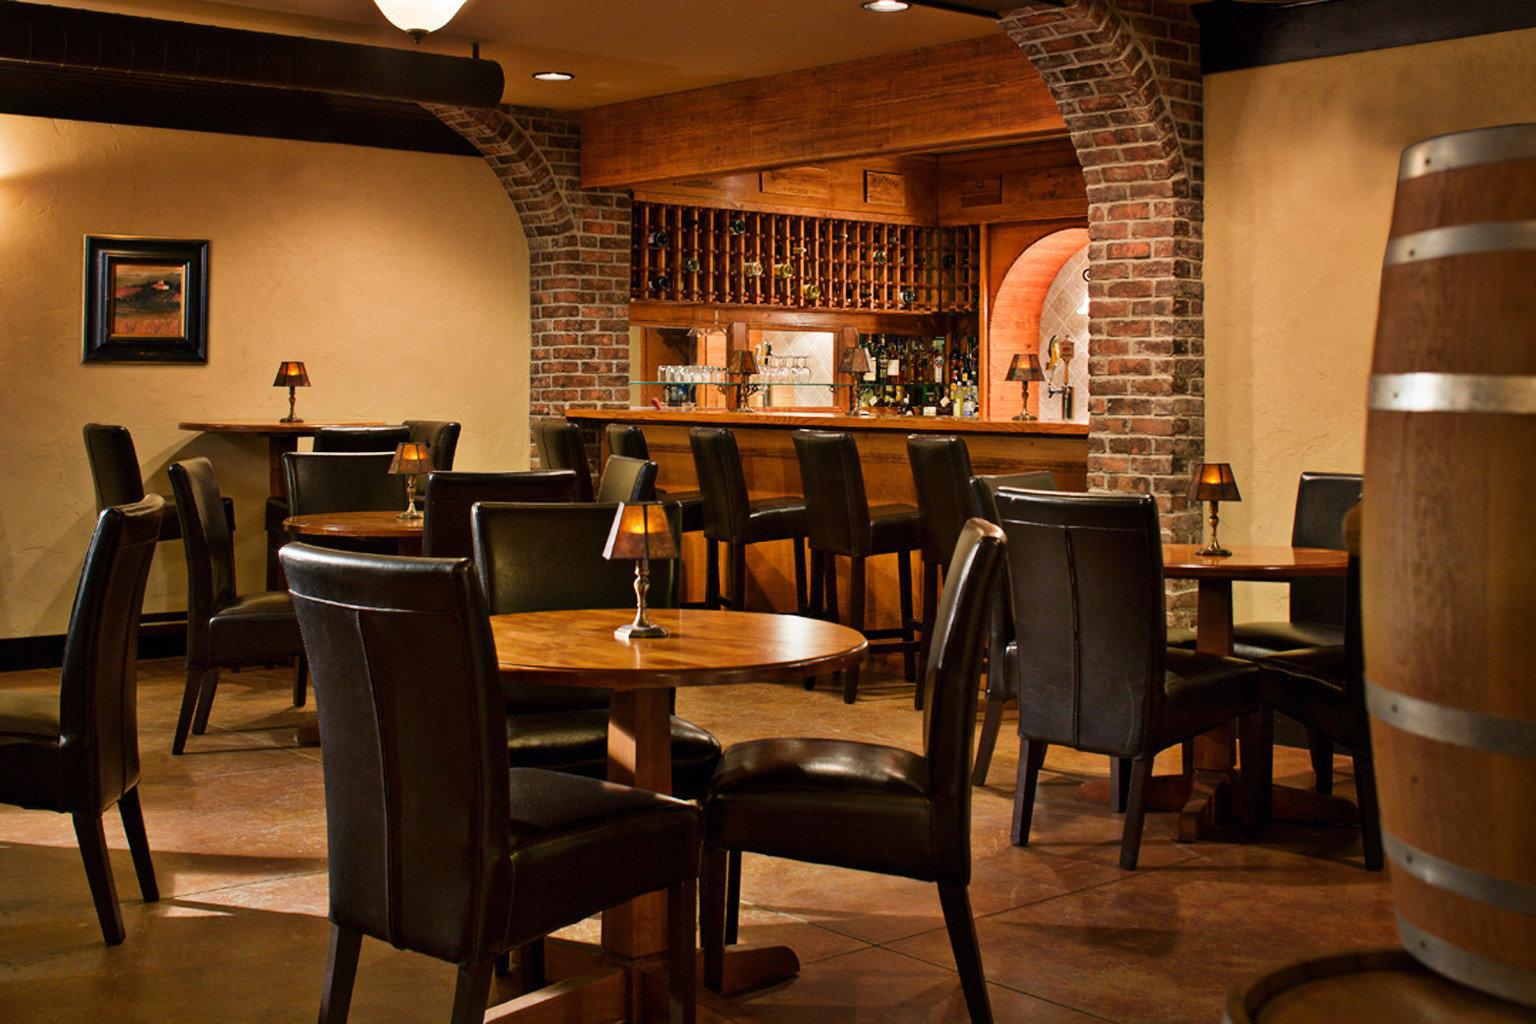 Dining Drink Eat Rustic chair restaurant café Bar dining table